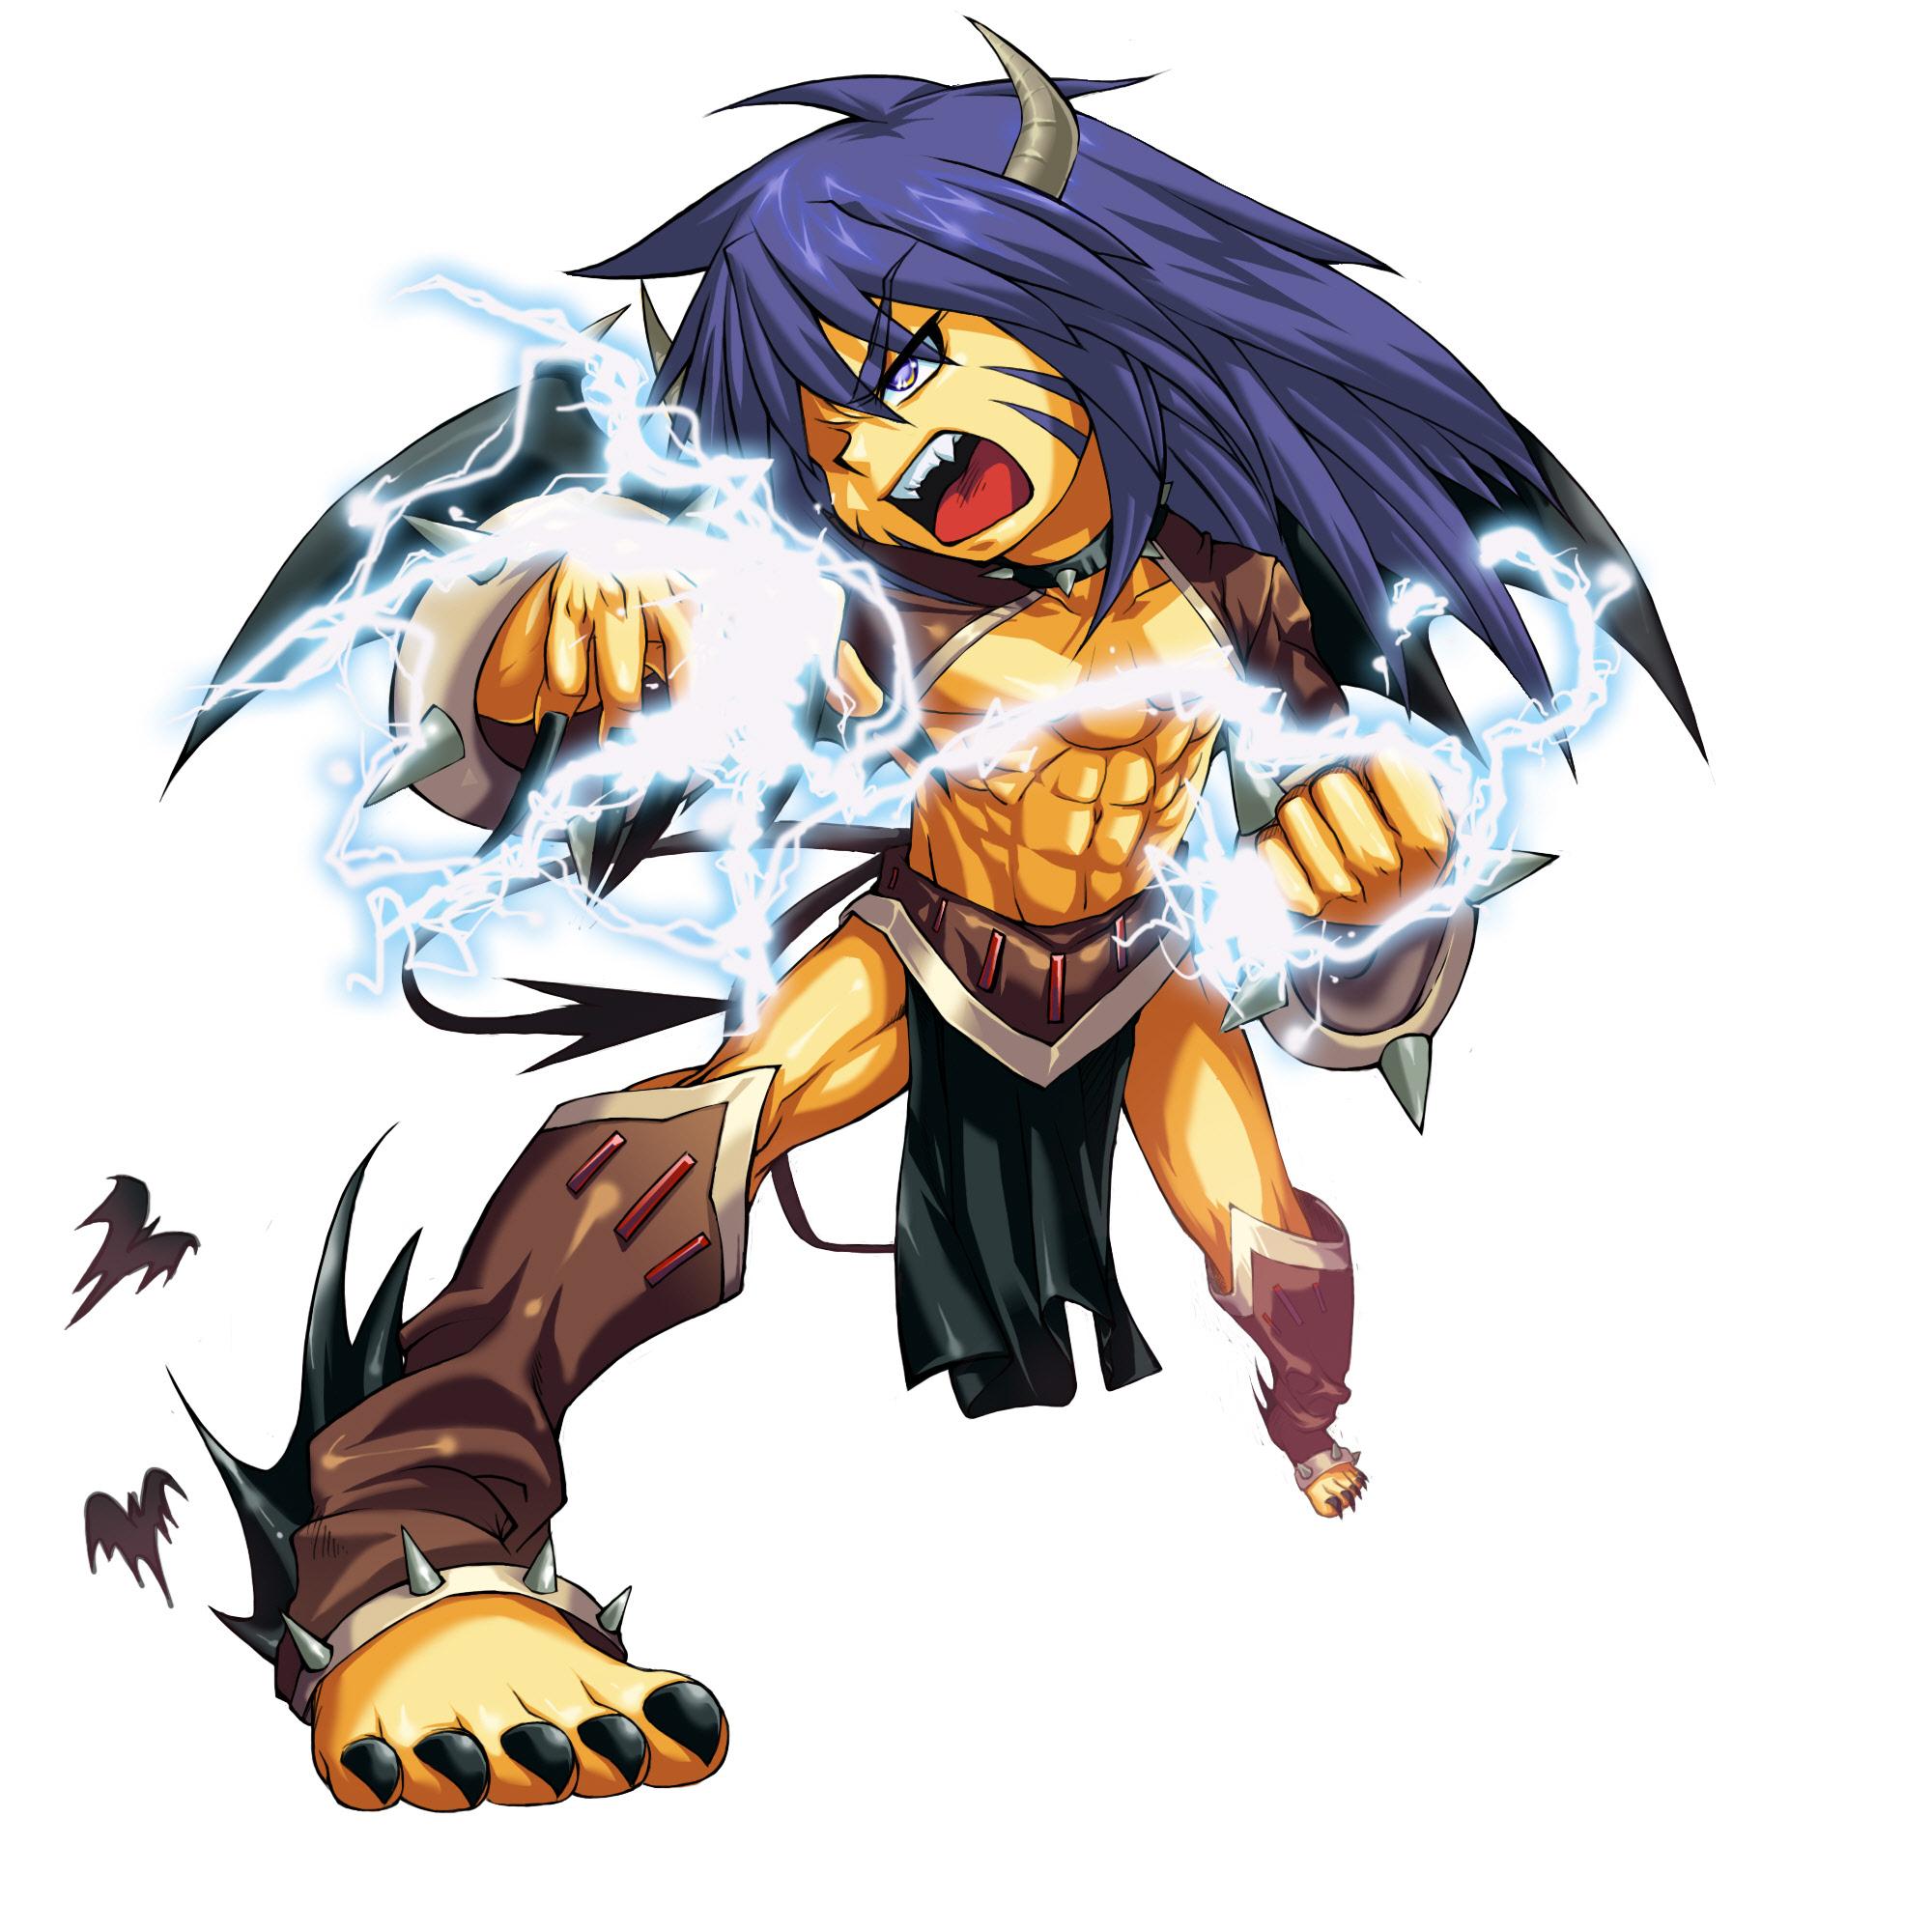 Marshal (Mini Fighter)